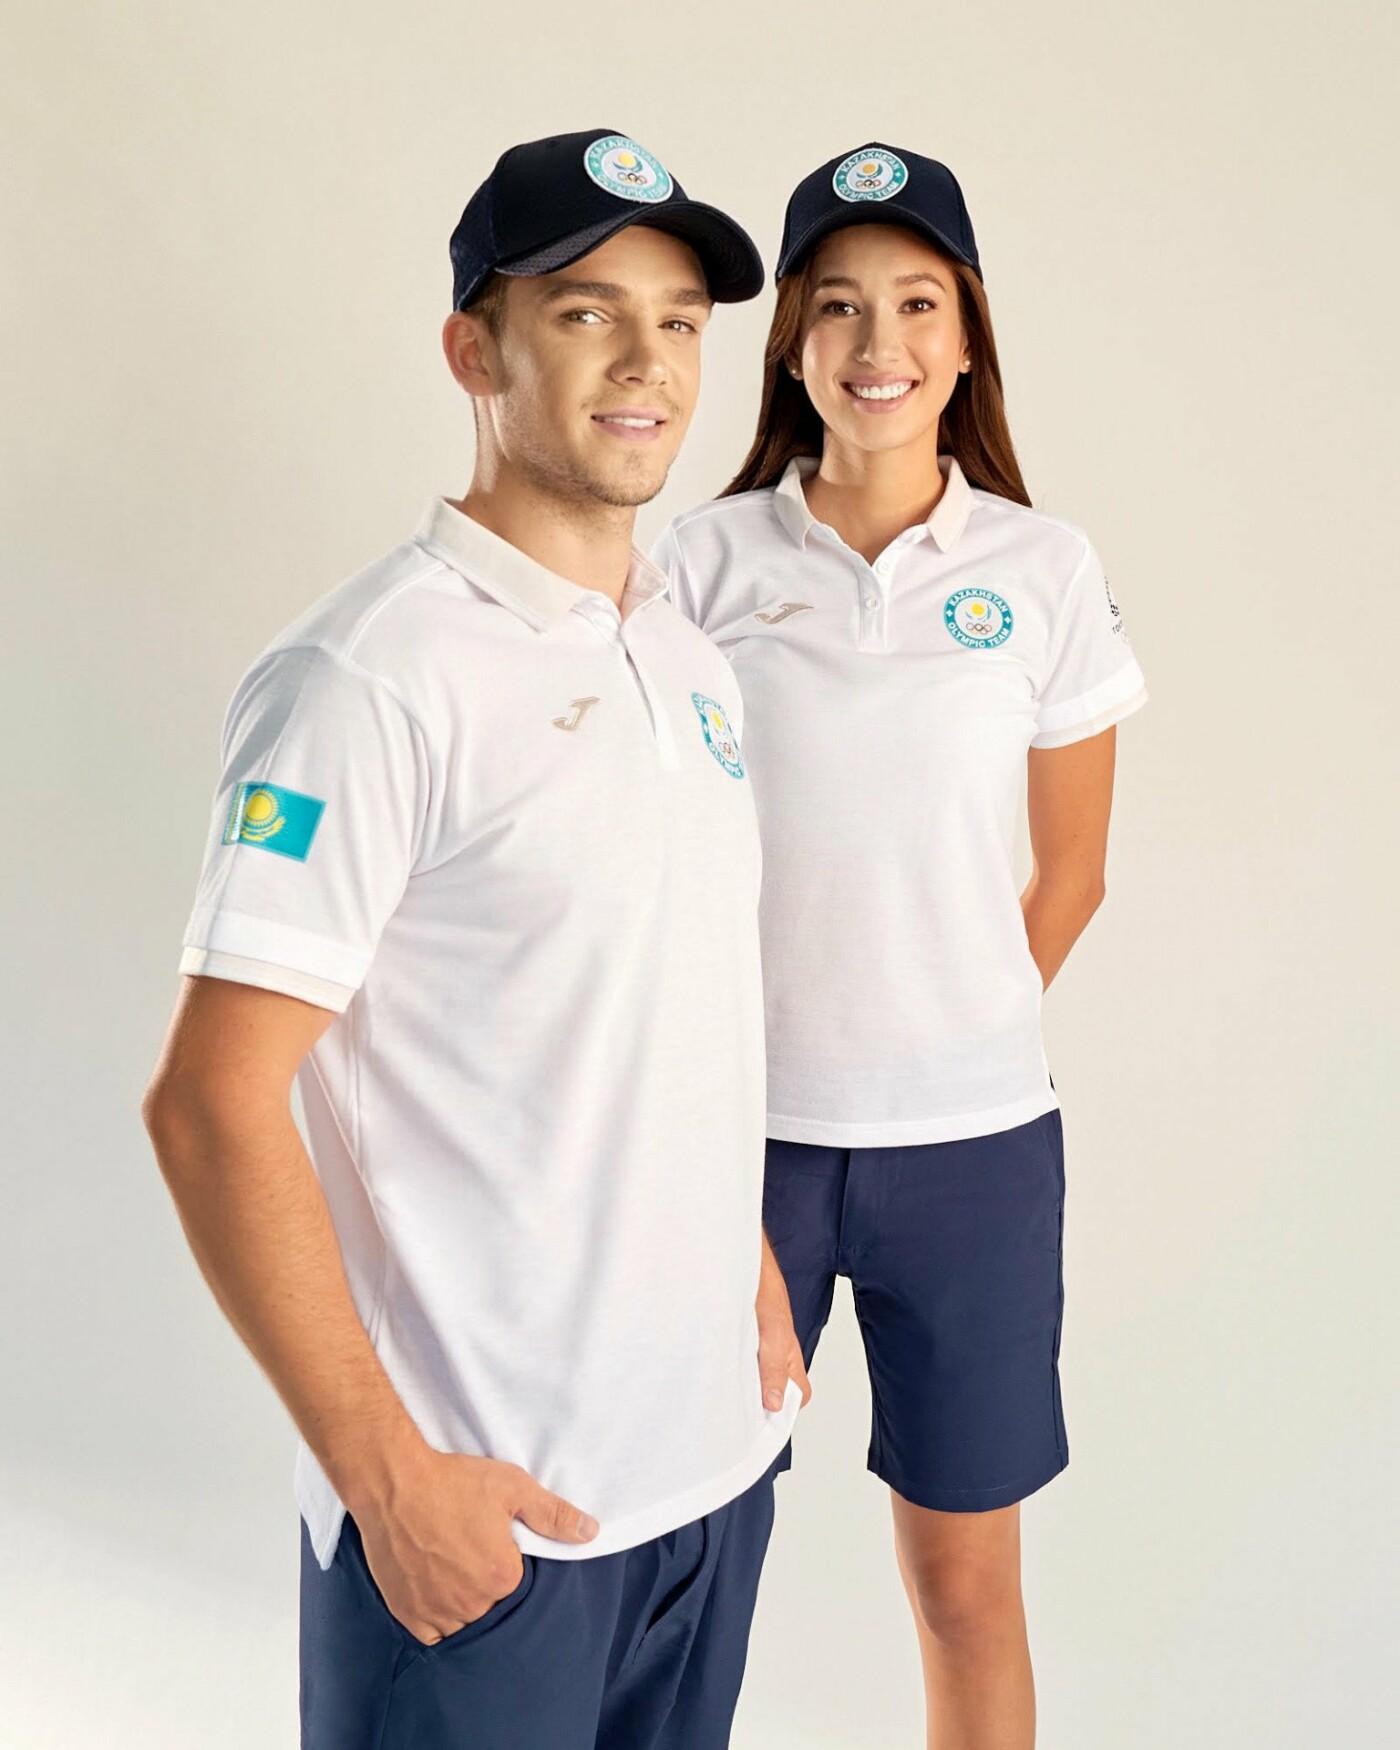 Новую олимпийскую форму казахстанских спортсменов представил НОК, фото-4